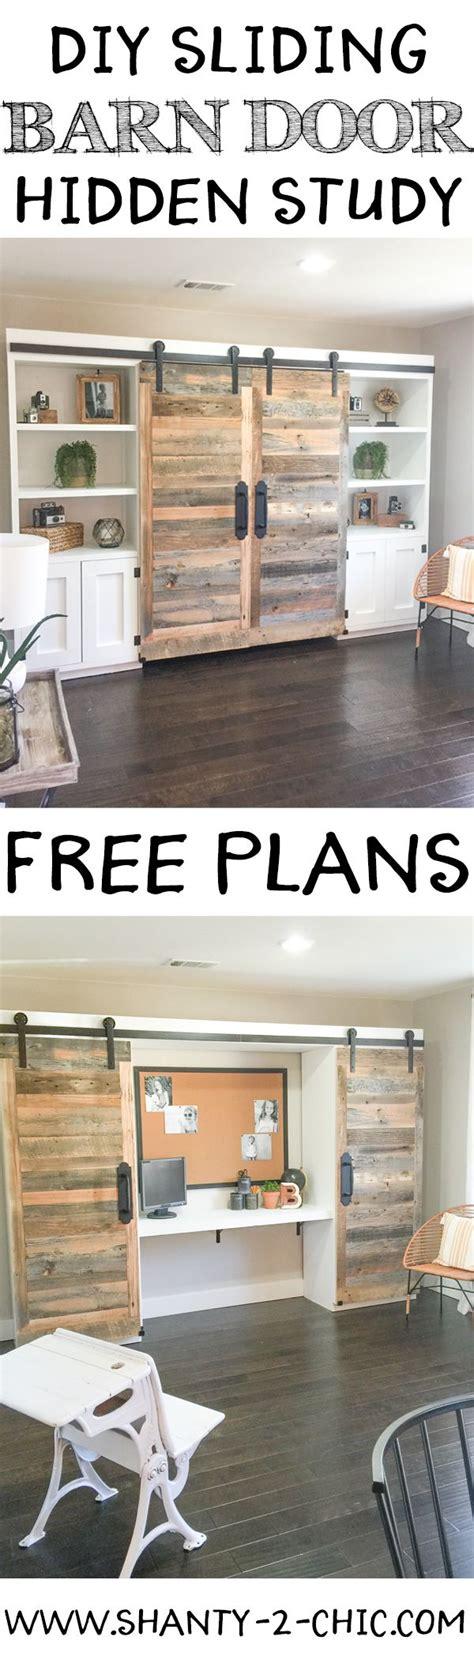 woodcraft kitchen cabinets best 25 murphy bed plans ideas on 1154